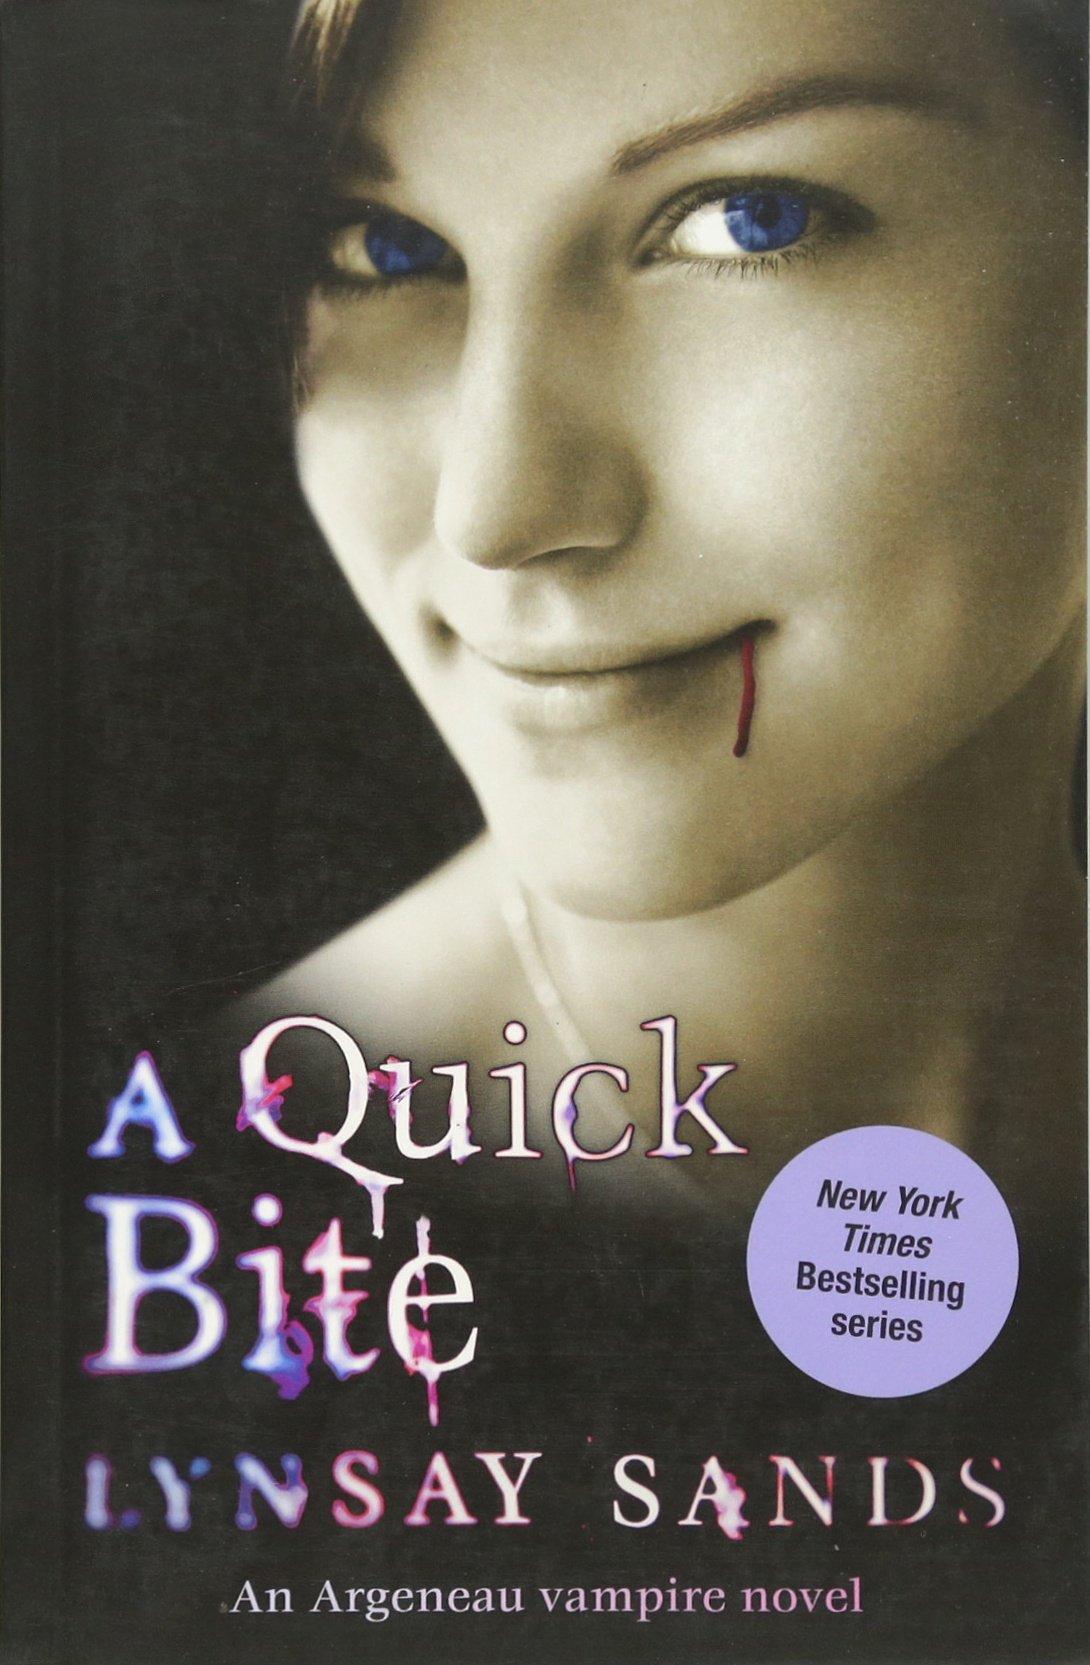 A Quick Bite: An Argeneau Vampire Novel: Amazon: Lynsay Sands:  9780575099494: Books